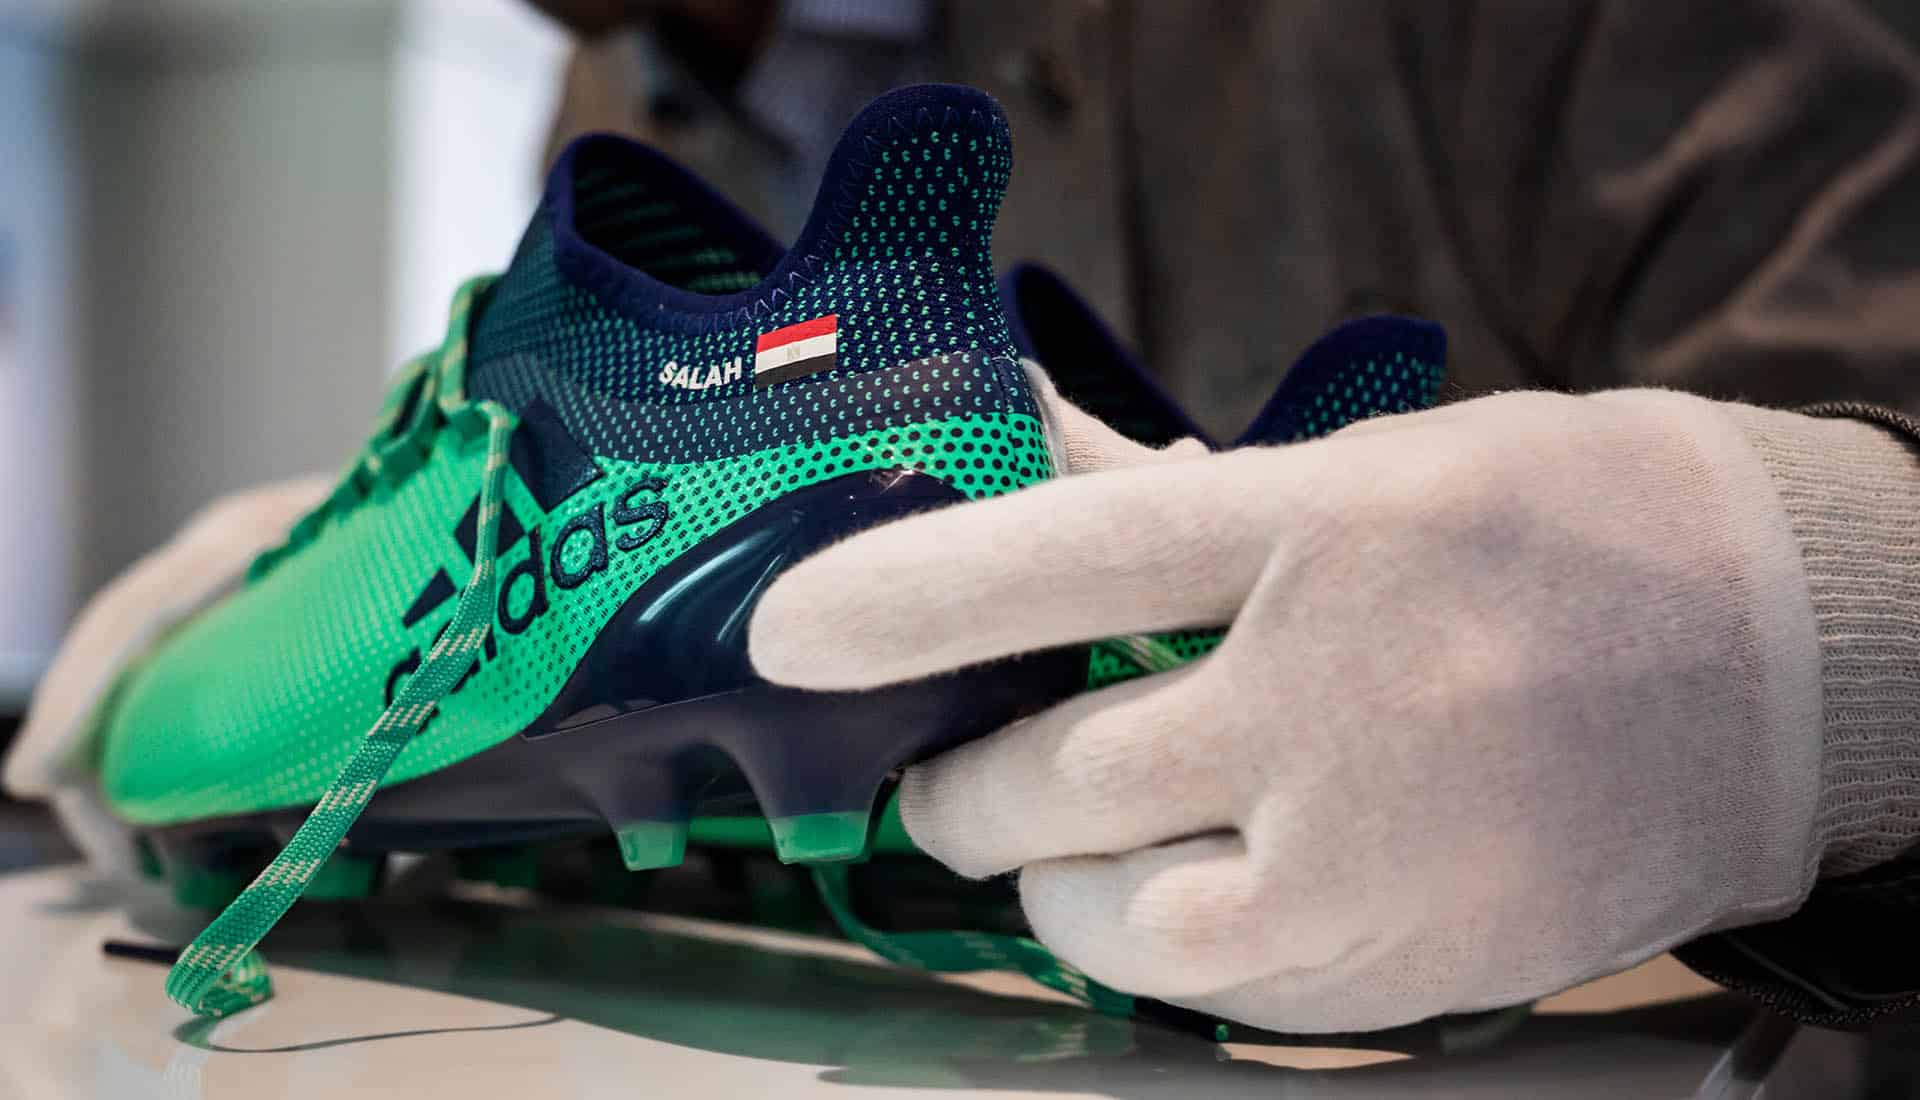 chaussures-football-adidas-X17-Mohamed-Salah-British-Museum-img3